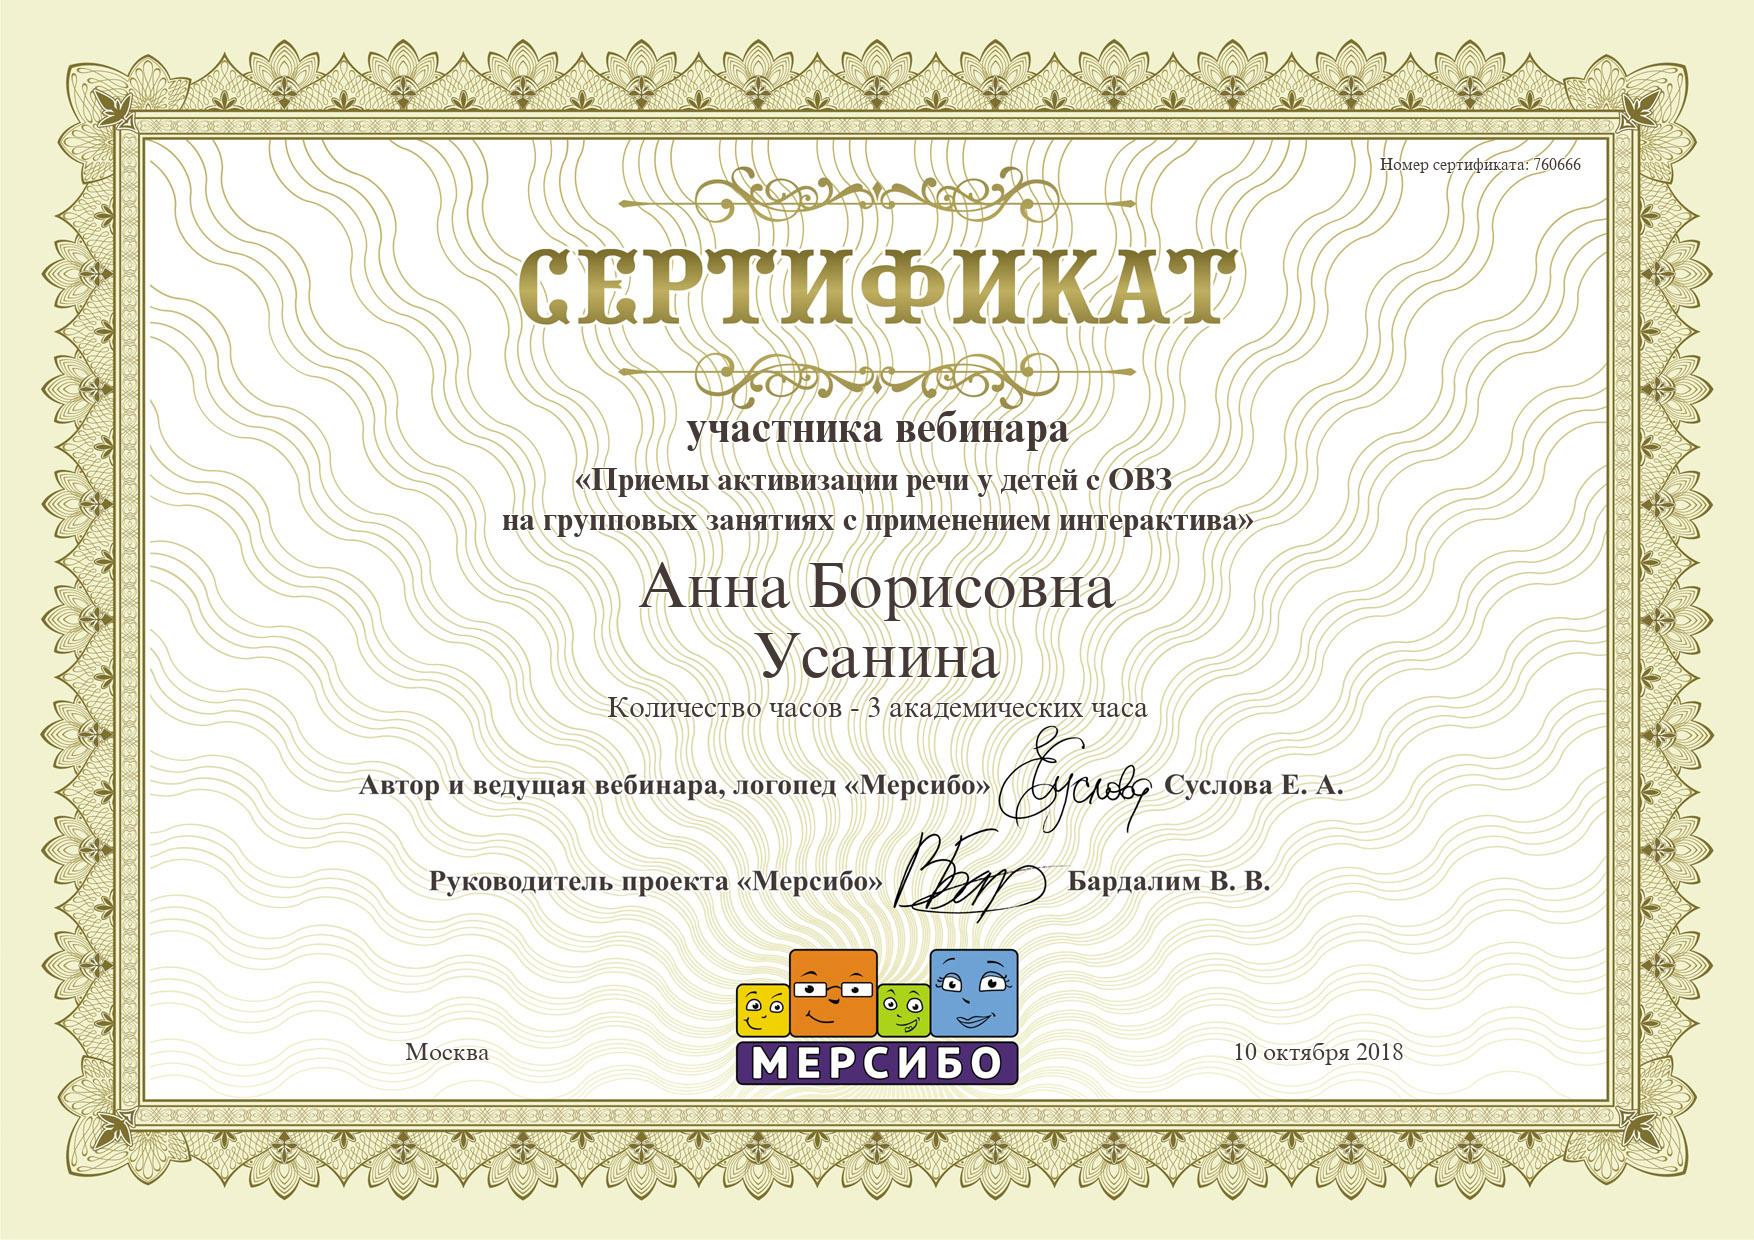 https://mersibo.ru/certificate/create?hash=KTYNLHPX5S1756P41R6QQSWNHSMBLMB